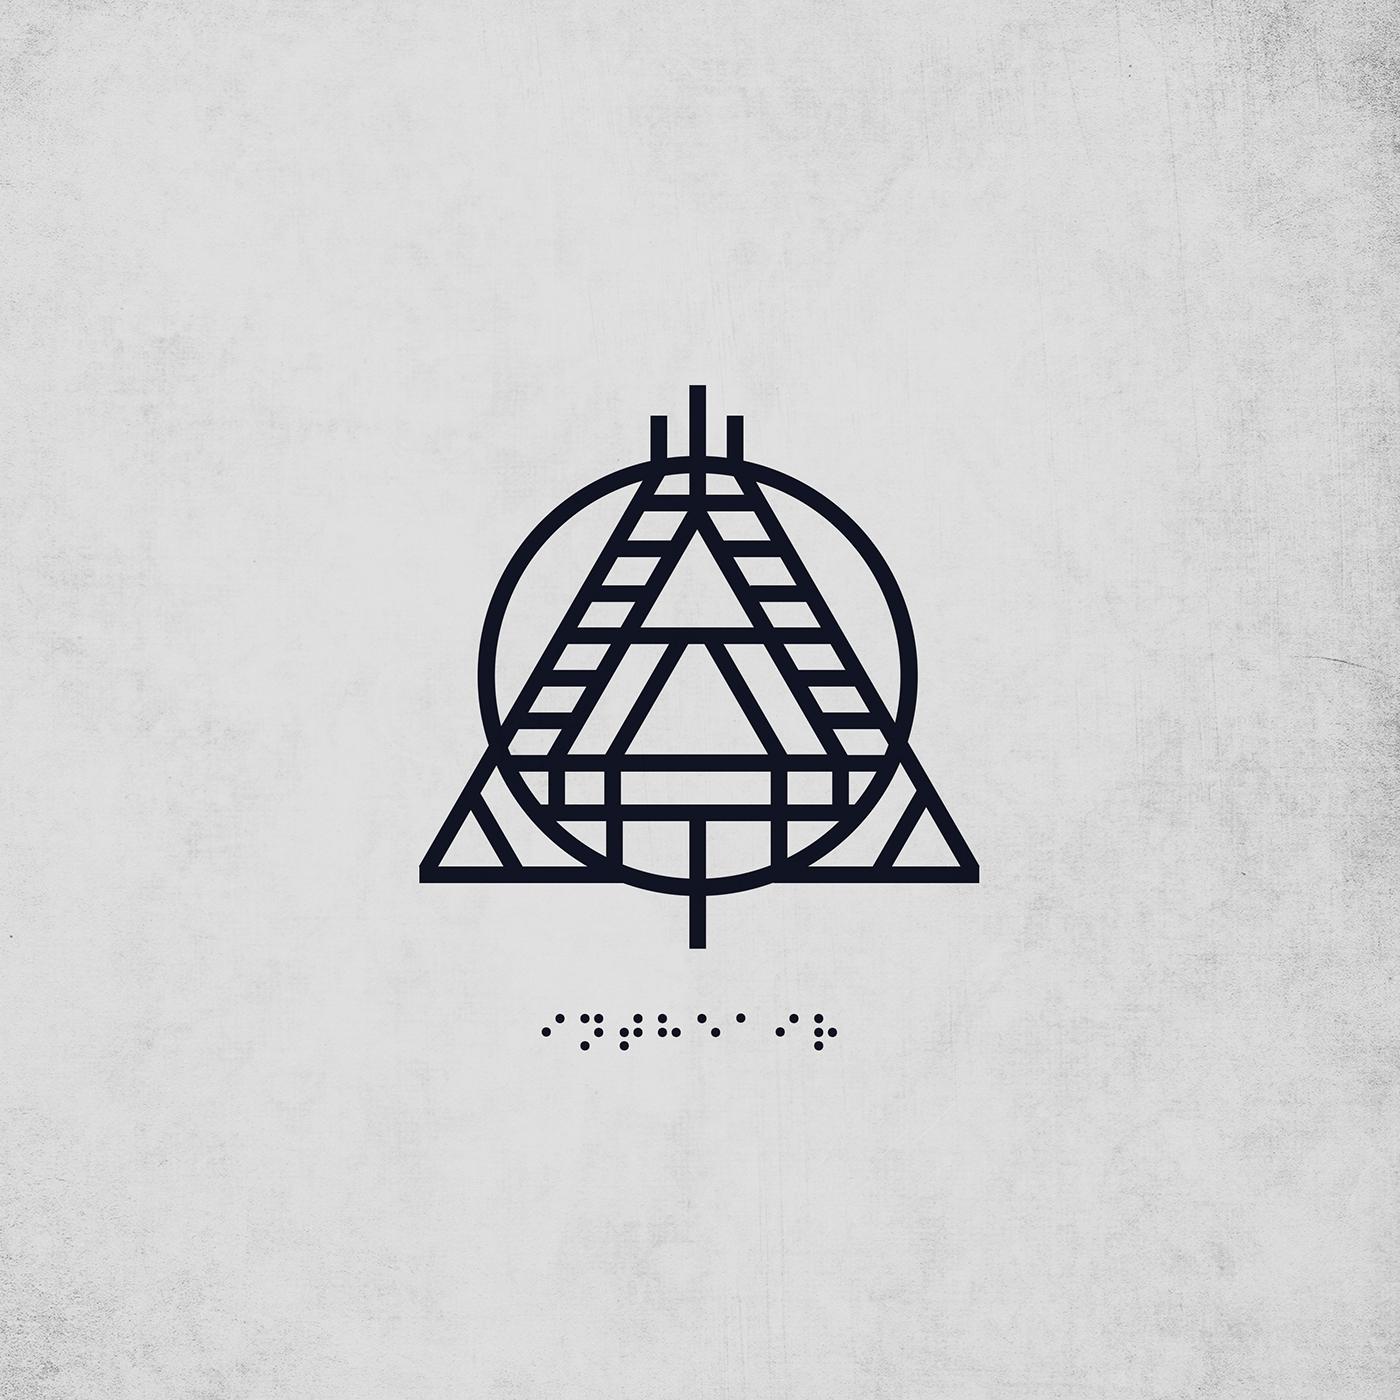 simetria-09